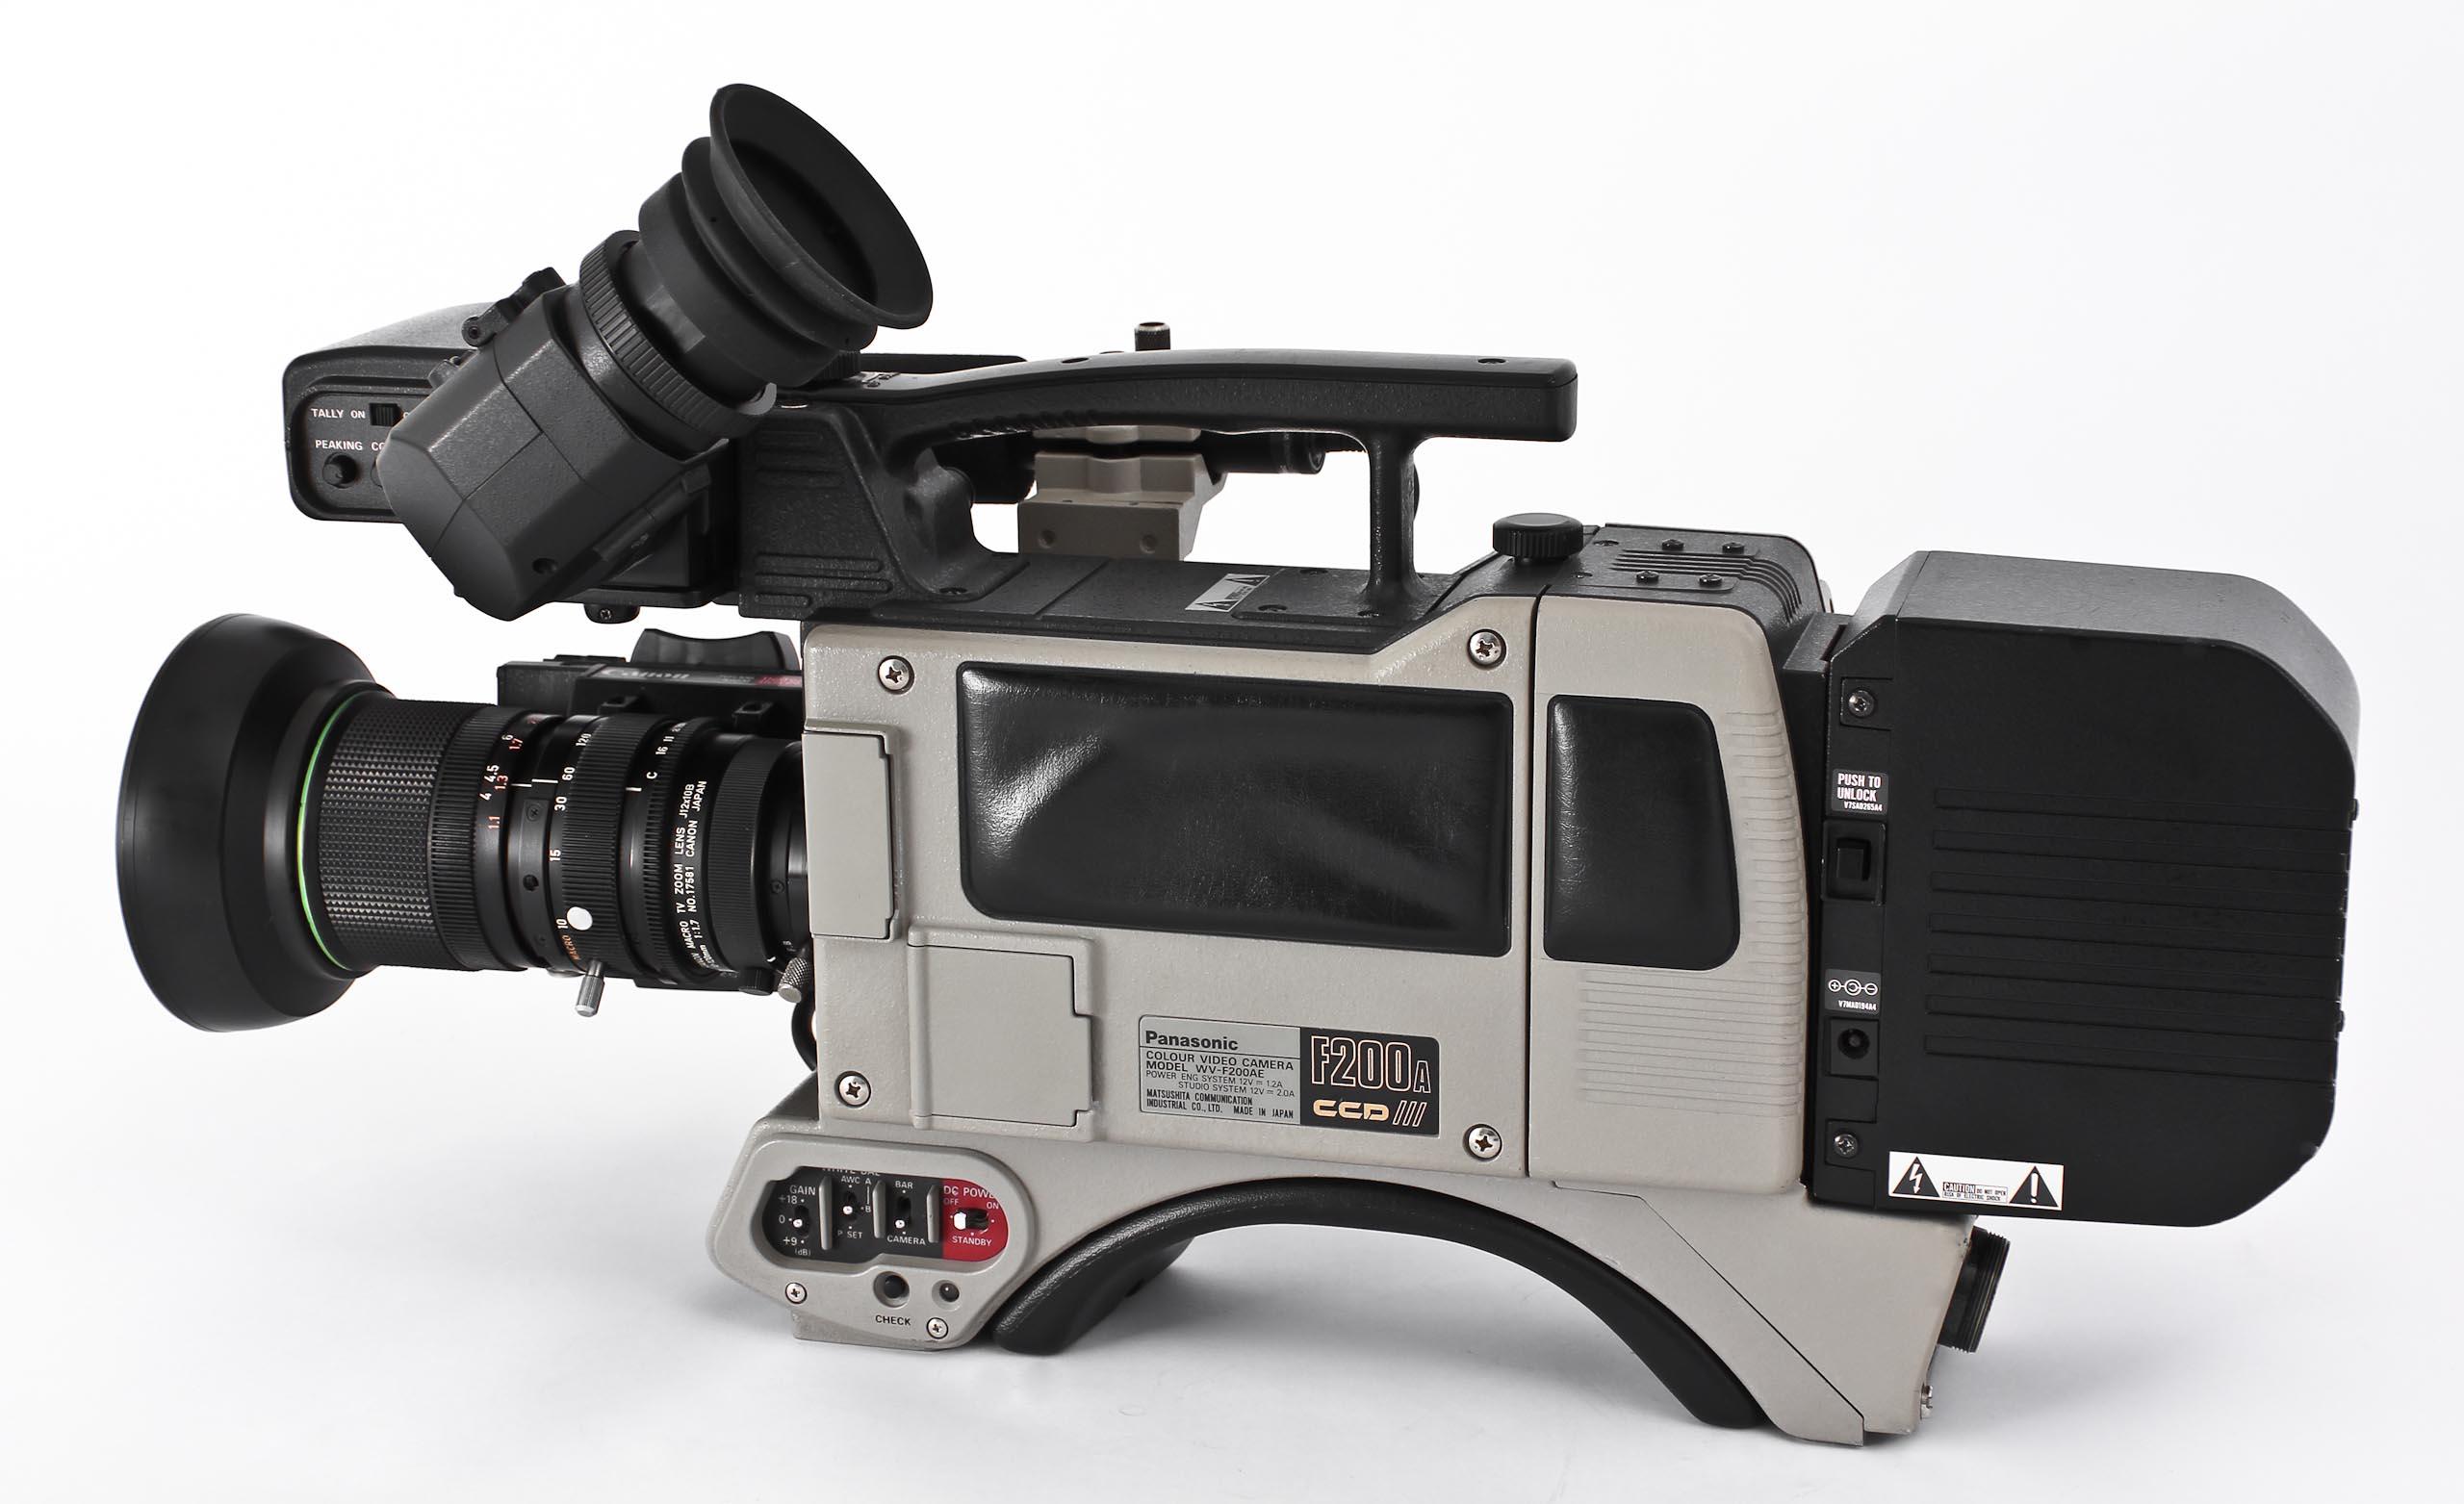 Panasonic WV-F200A - 1